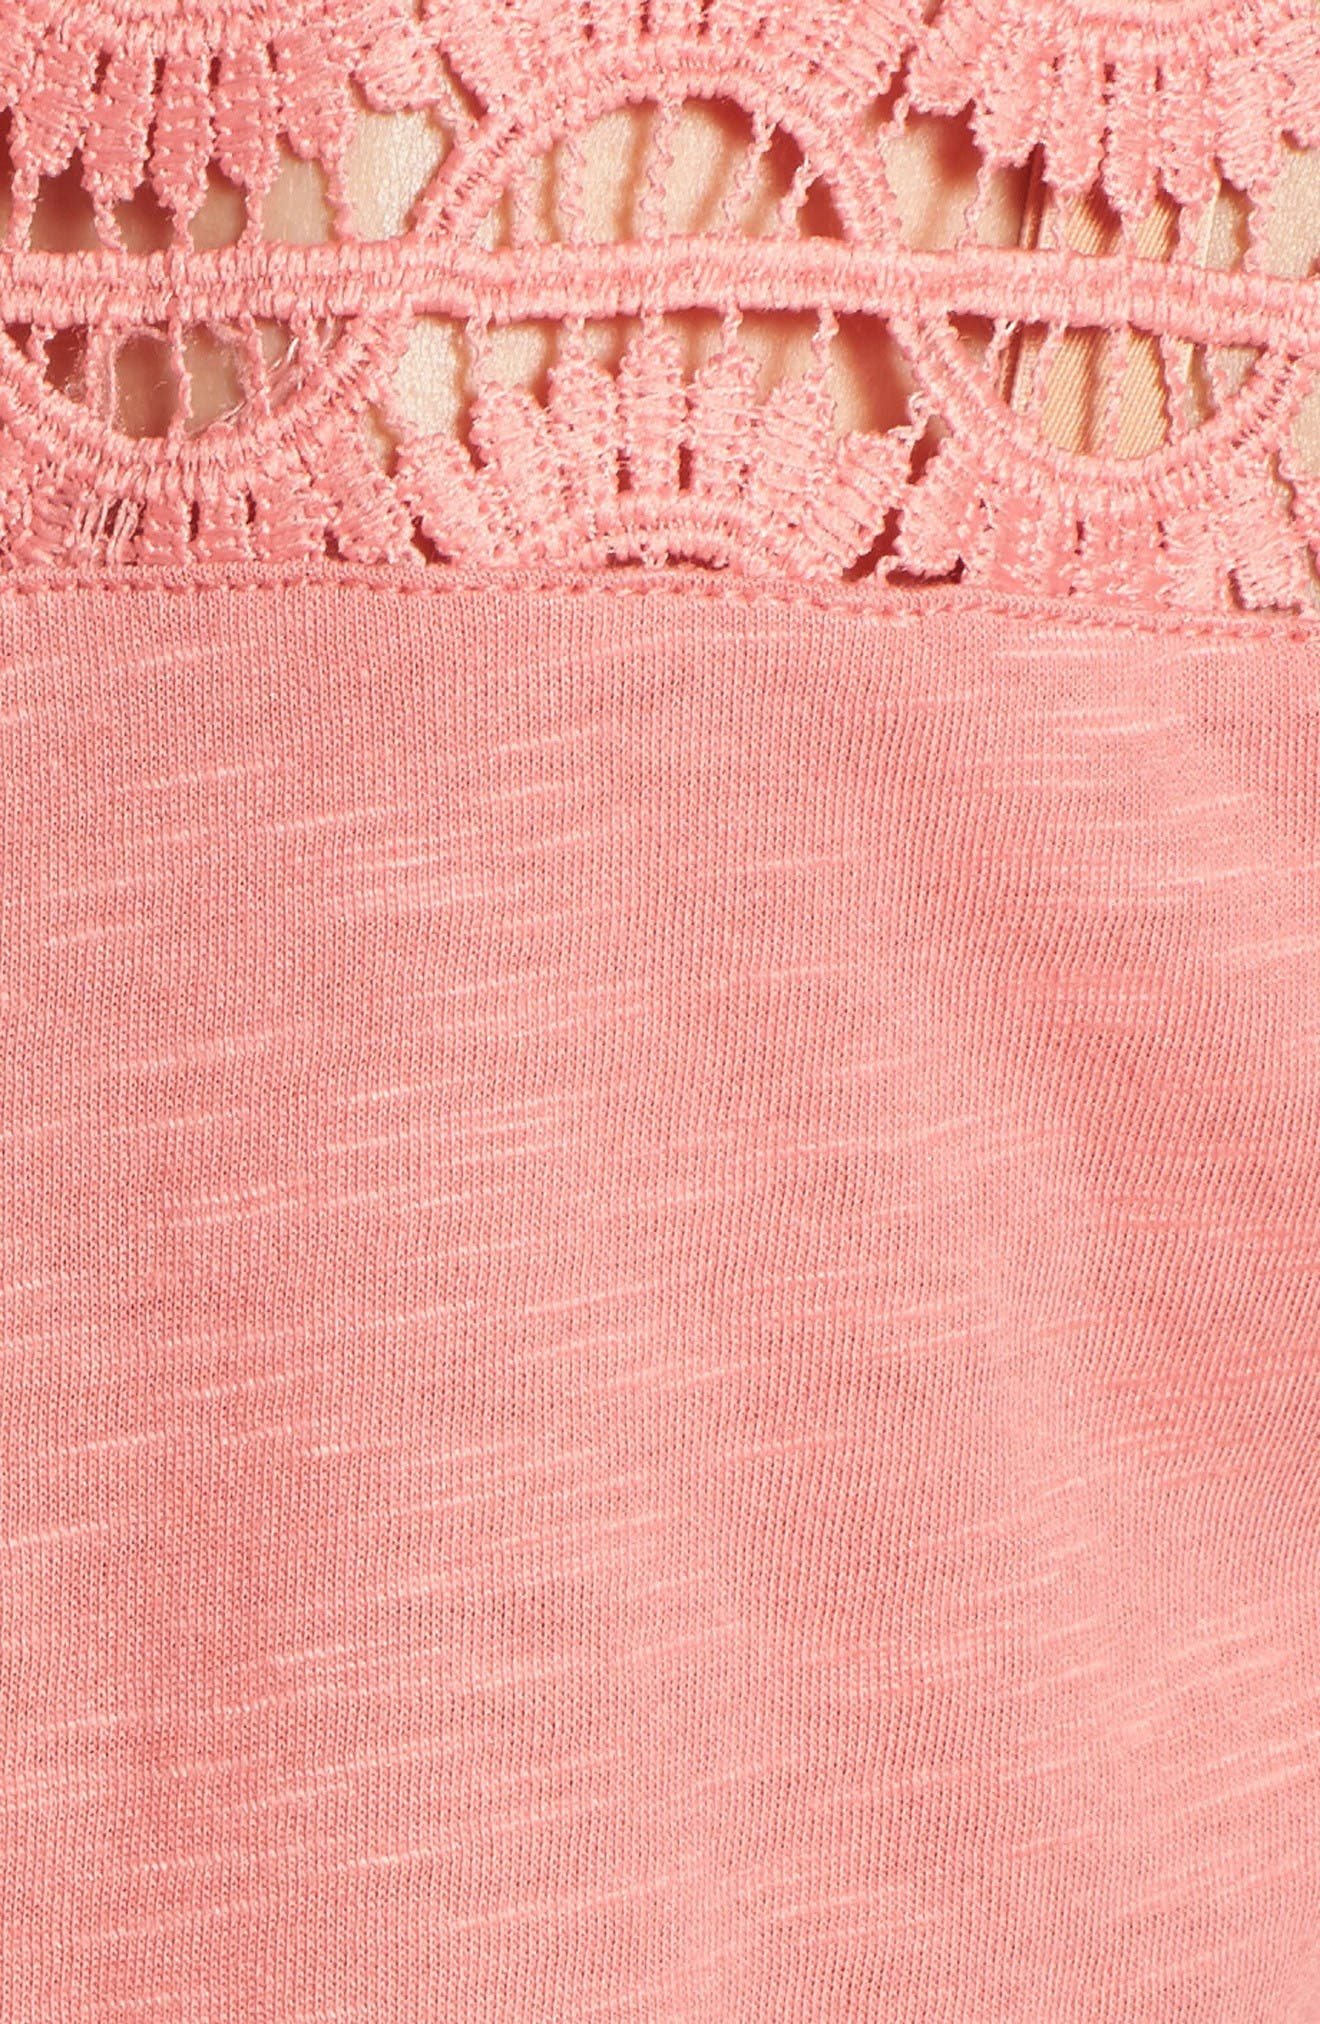 Alternate Image 5  - Caslon® Lace Yoke Knit Top (Regular and Petite)